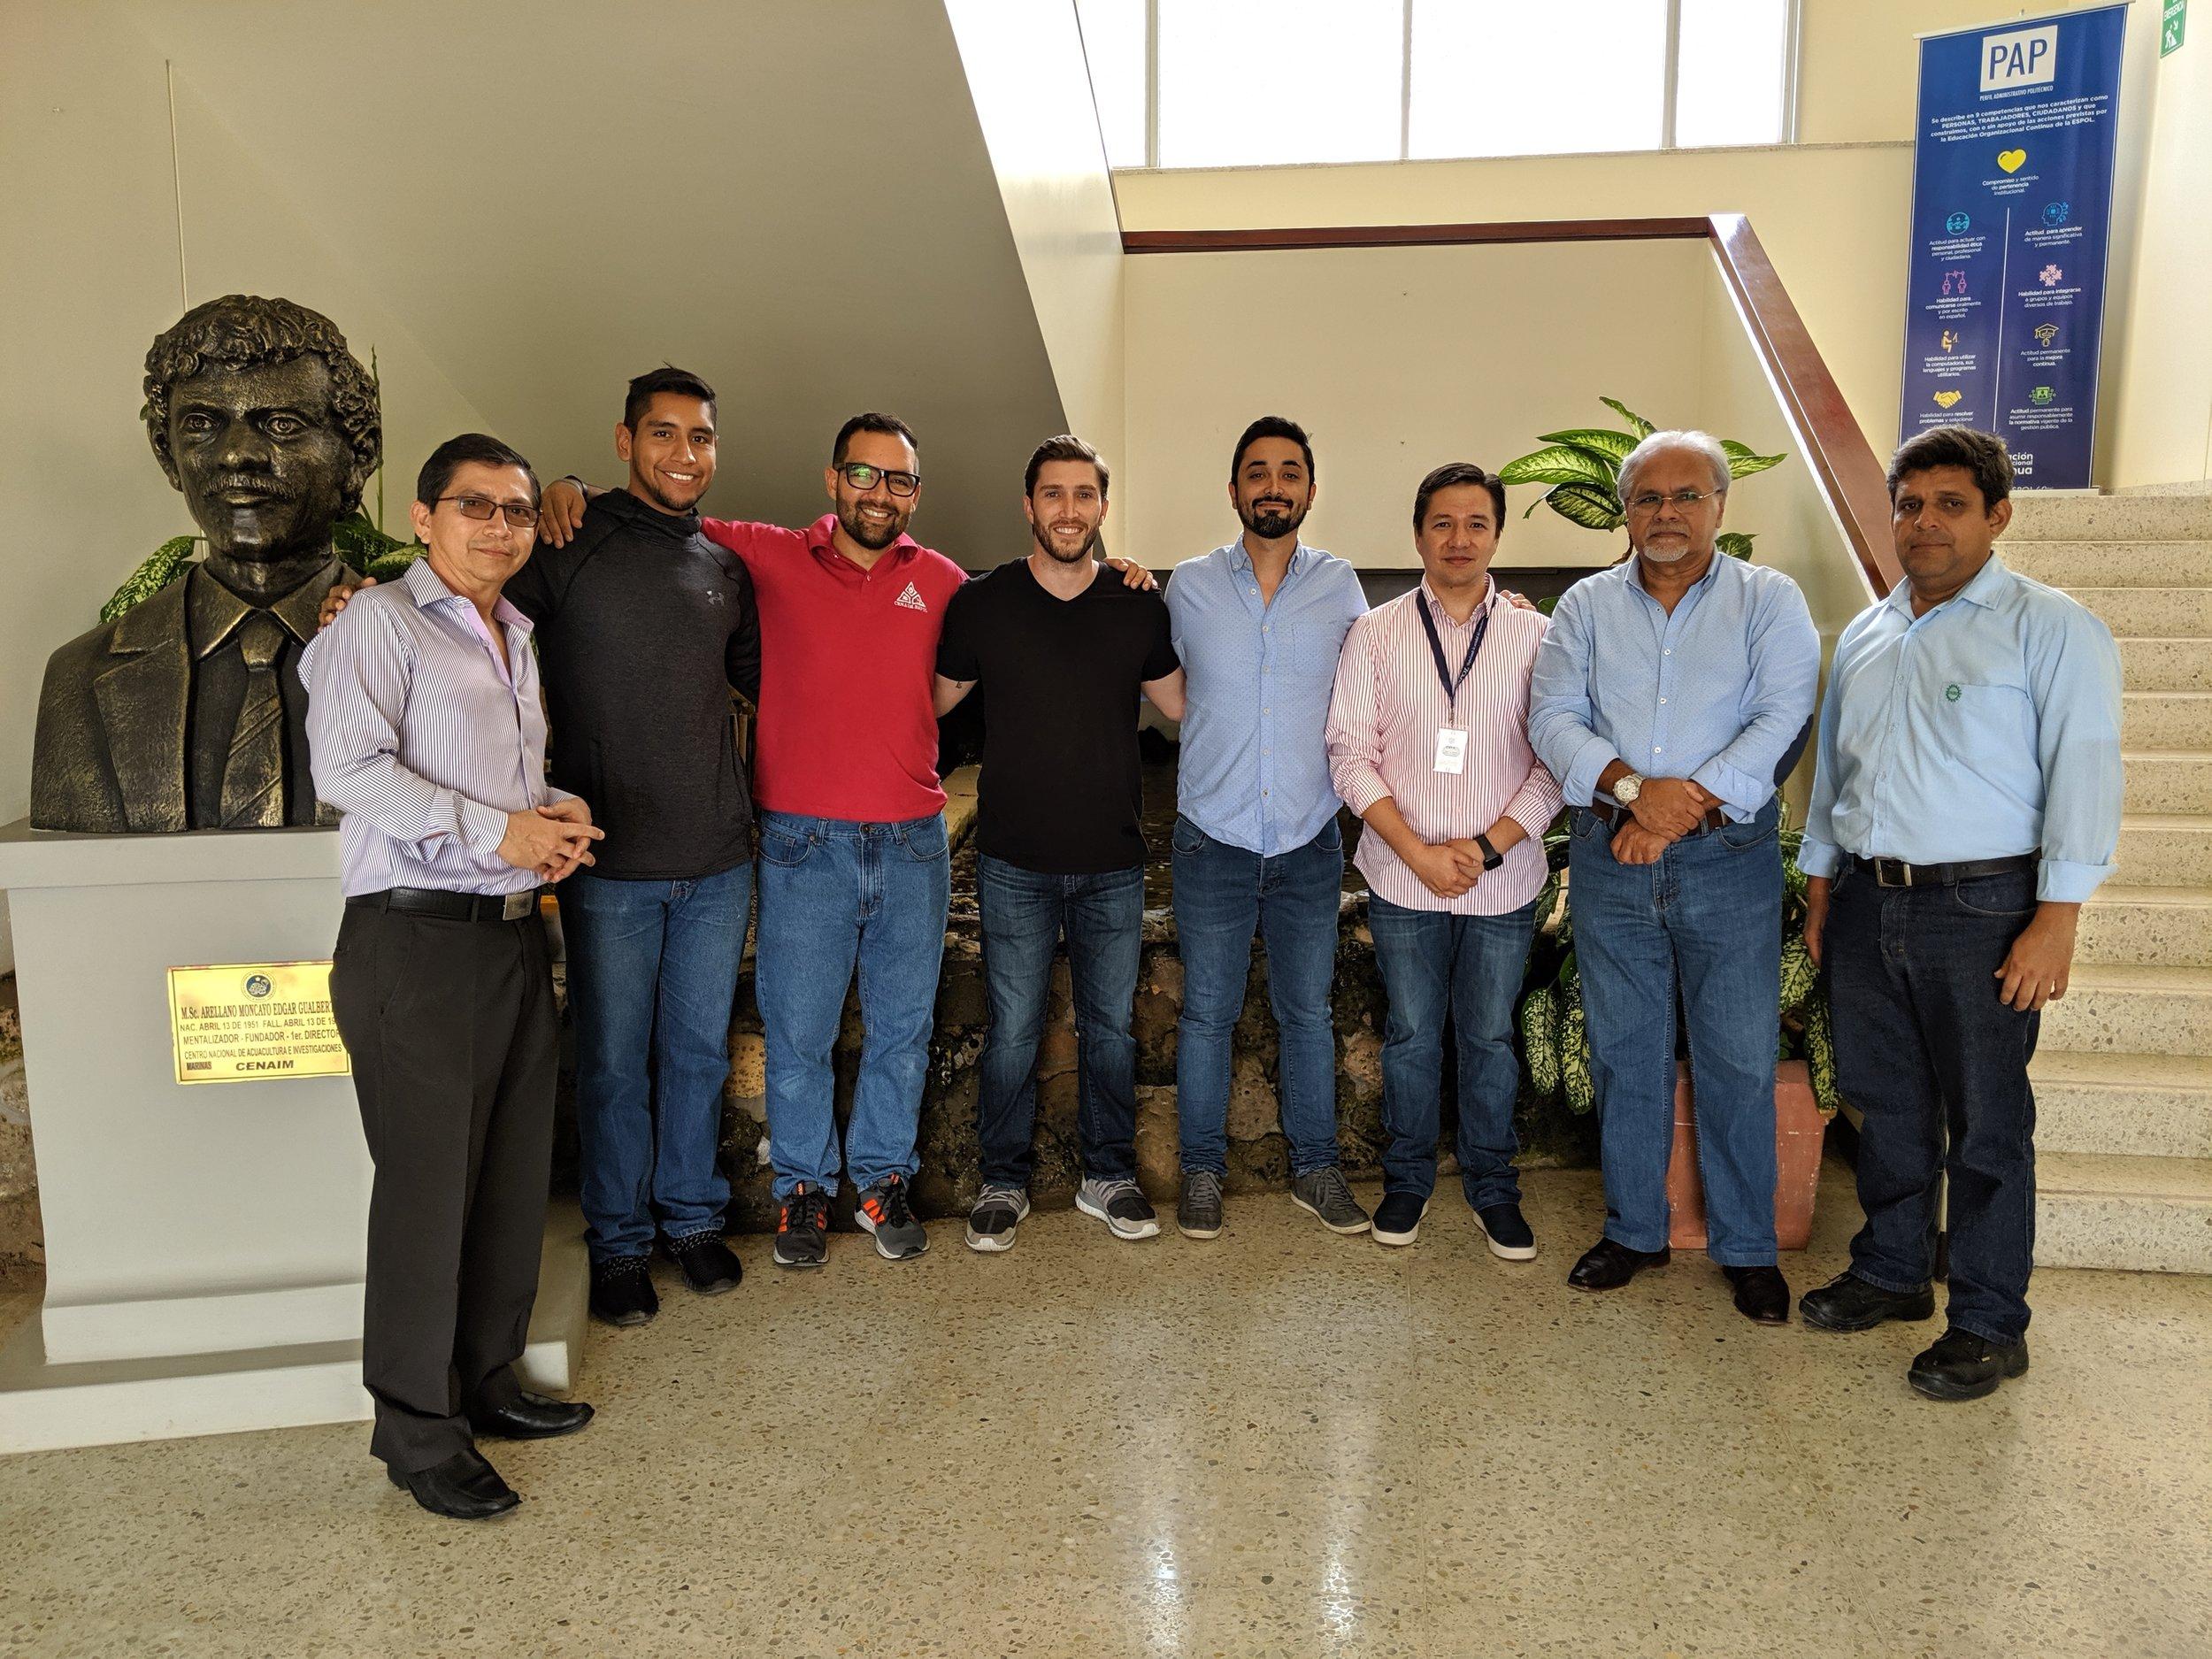 Empresarios representantes de Consorcio NOBIS junto a profesionales de CENAIM-ESPOL e I3LAB-ESPOL.